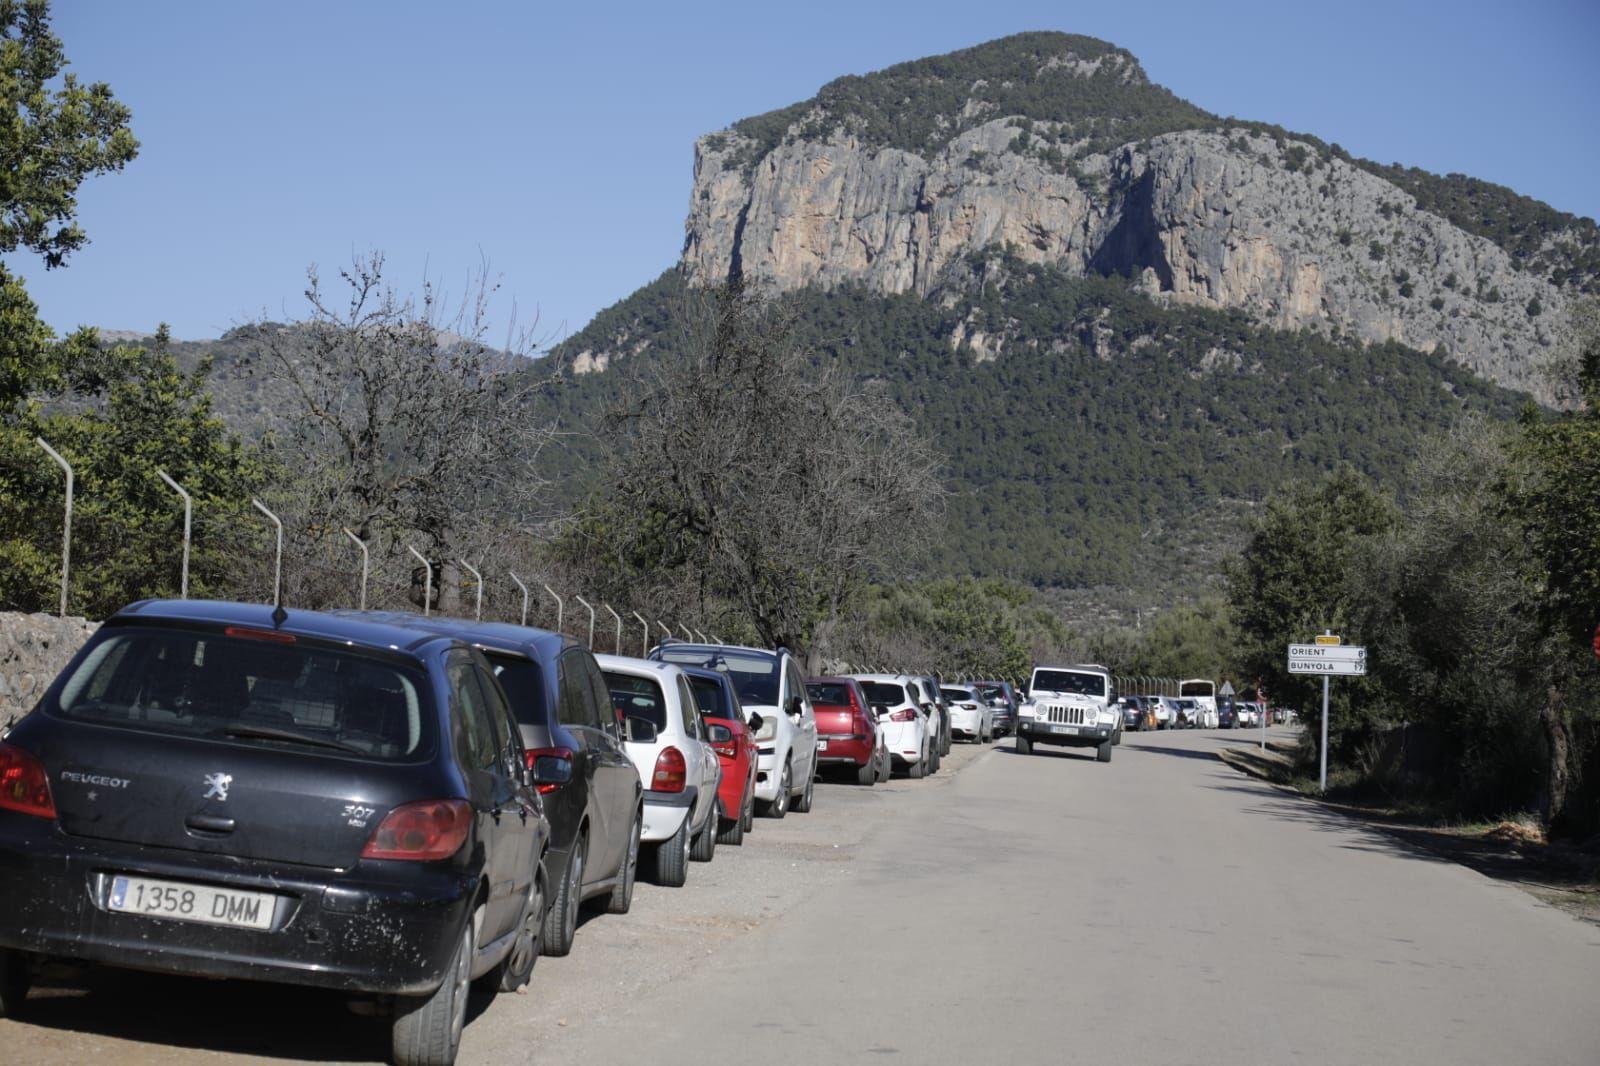 La aglomeración de visitantes obliga a cerrar el Salt des Freu